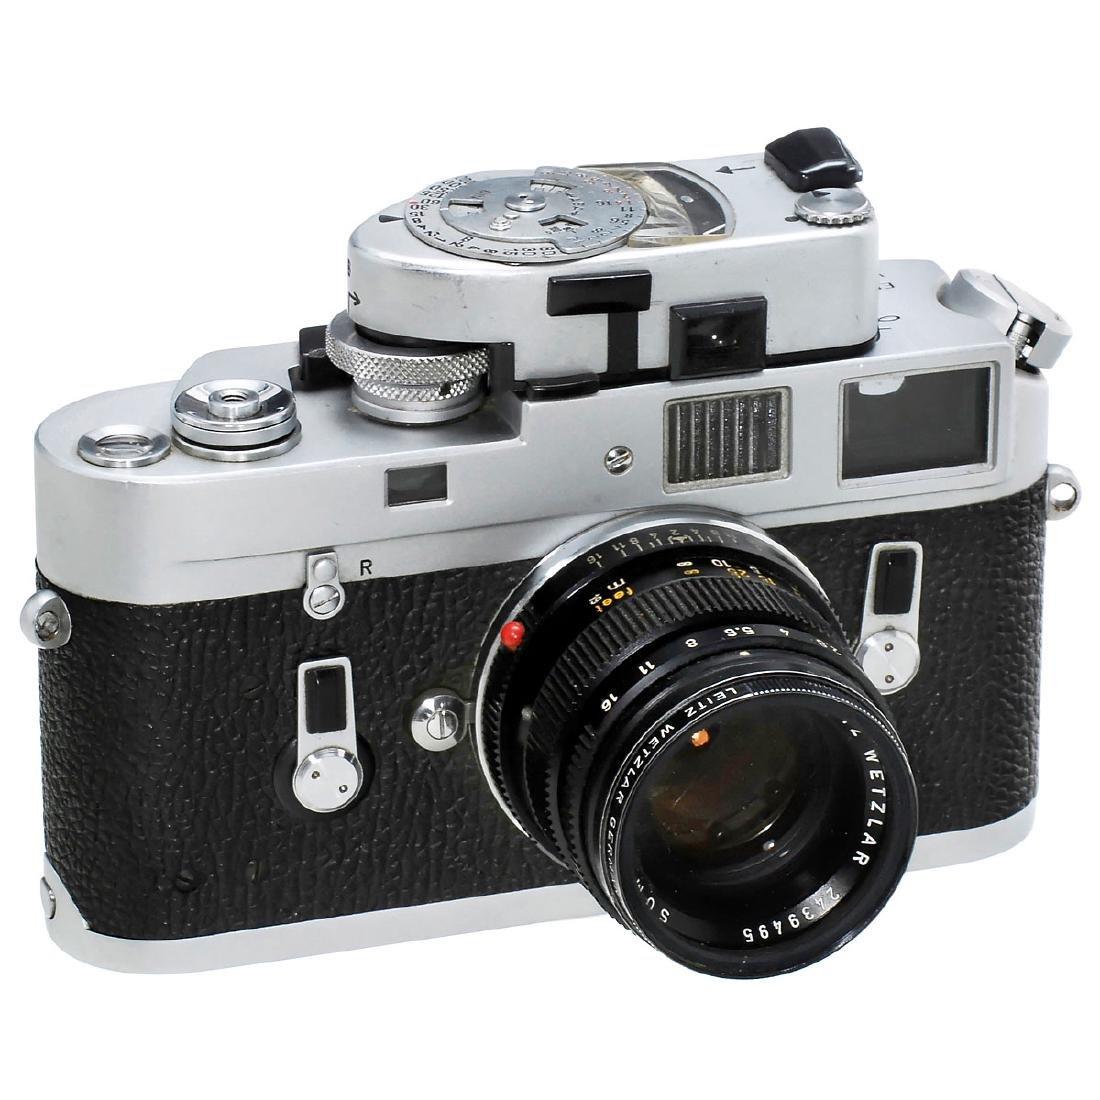 Leica M4 Body, 1970/71